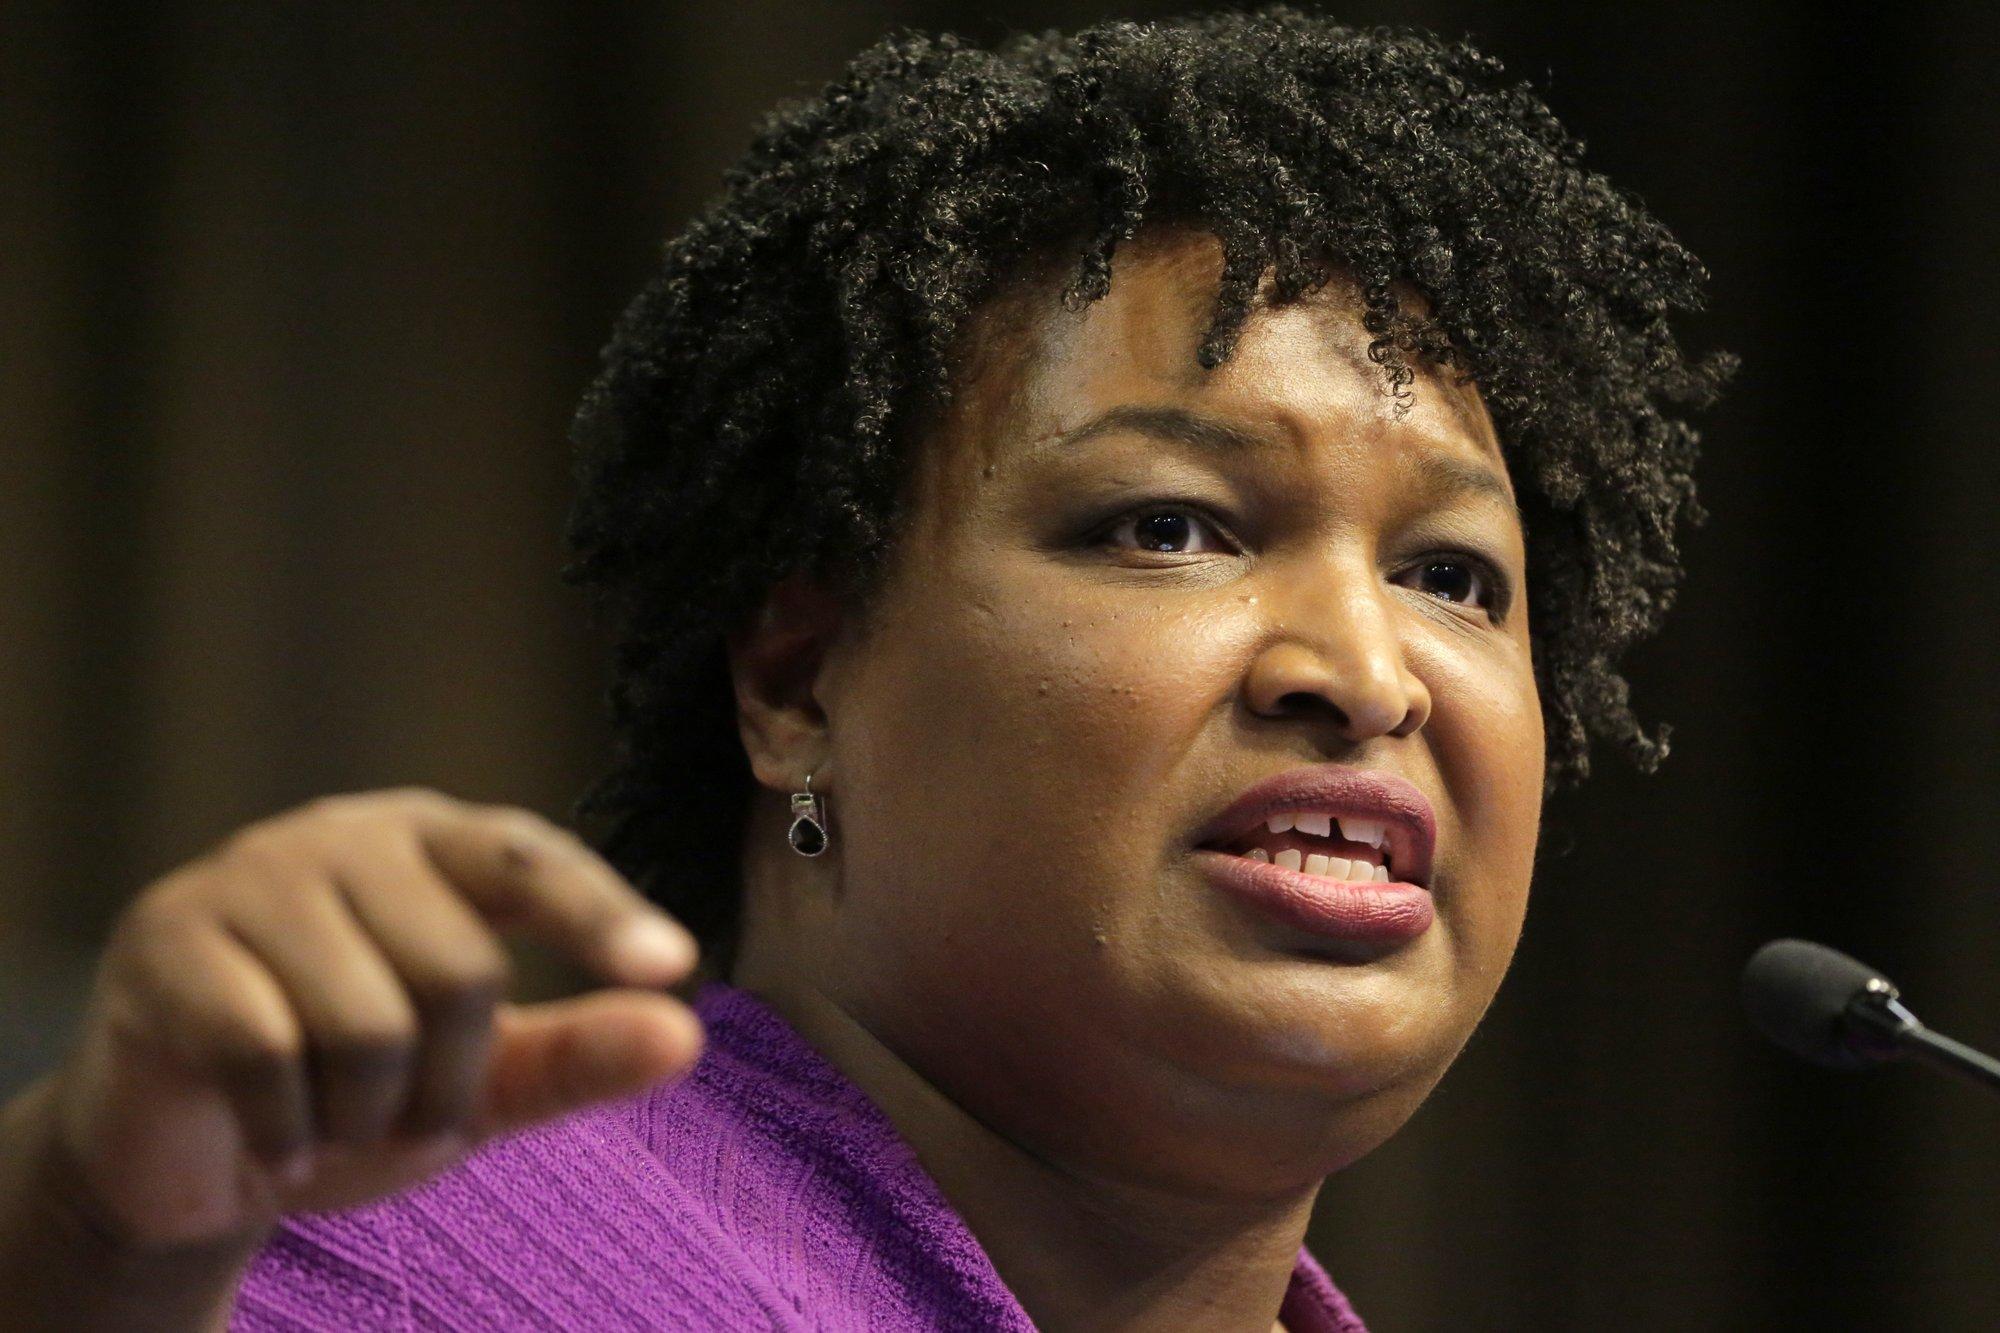 Georgia Democrat Stacey Abrams won't run for US Senate in 2020